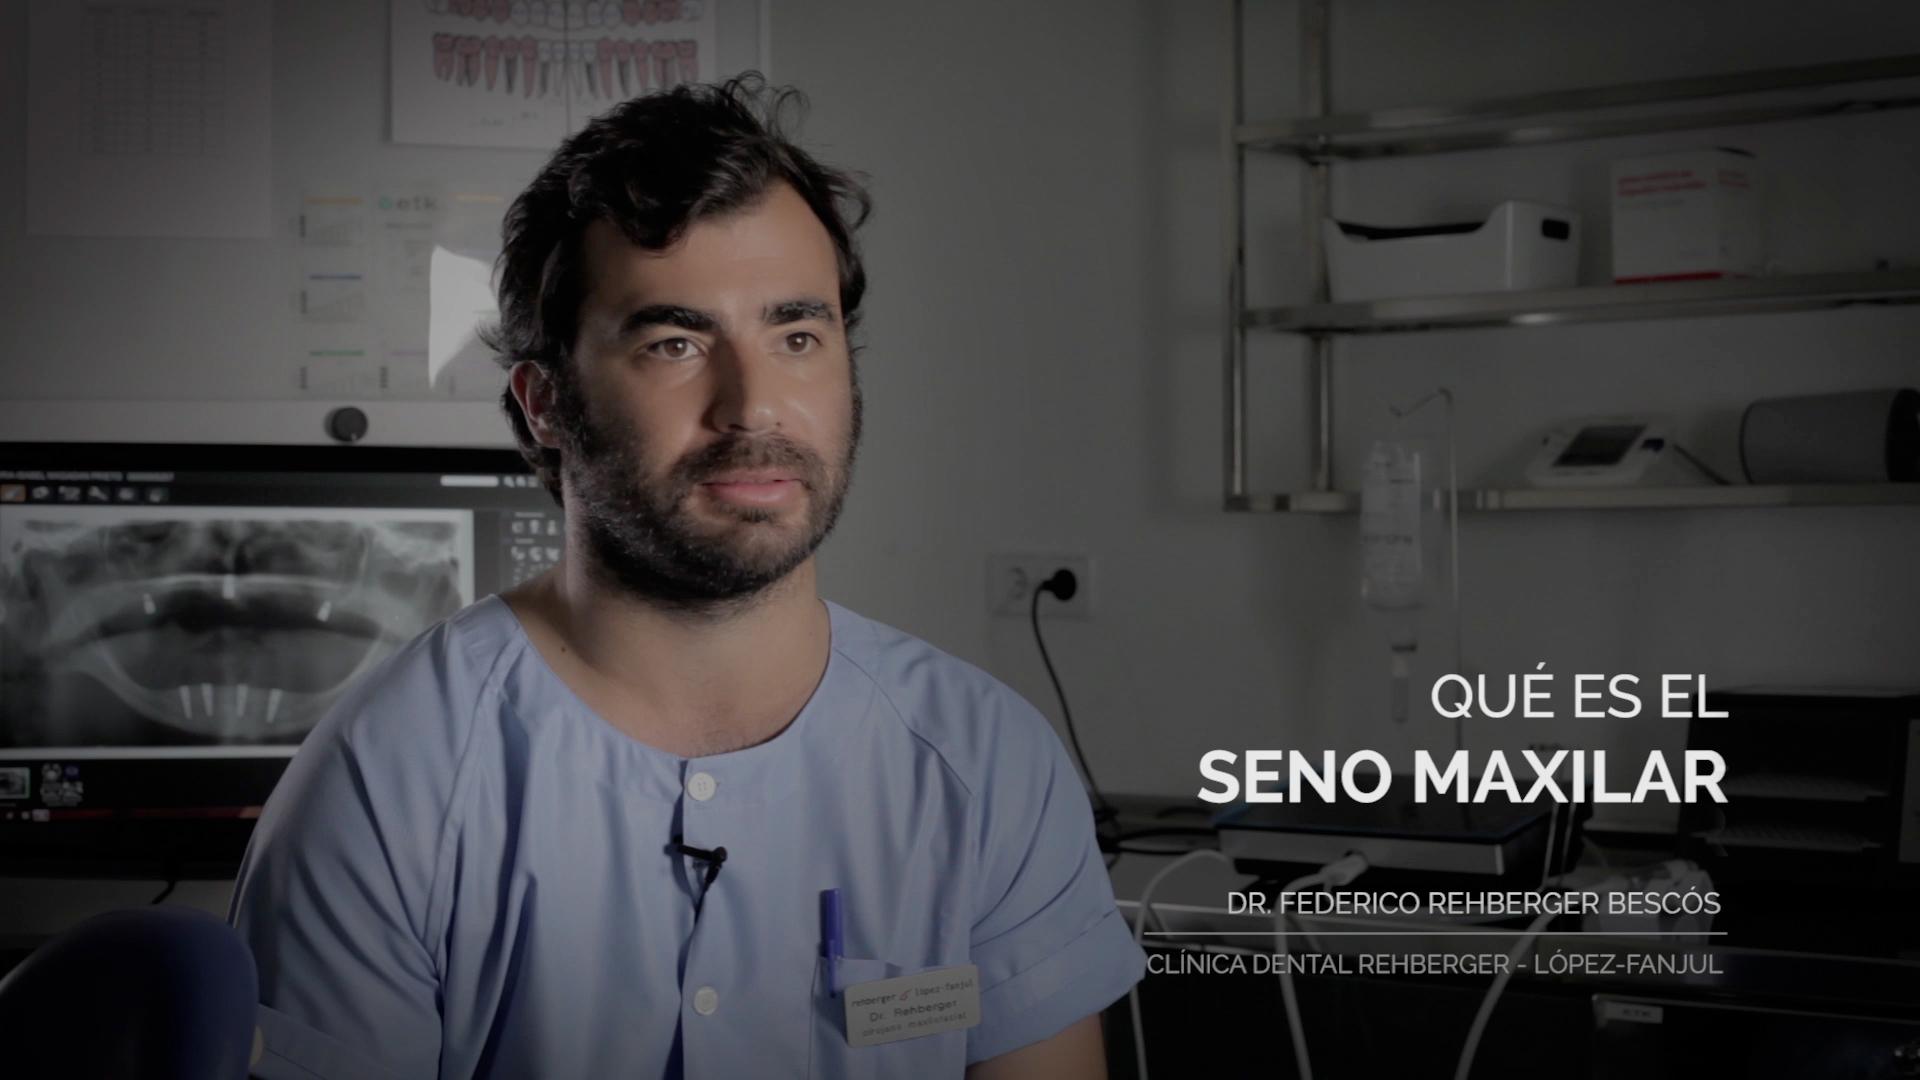 Clínica Rehberger - López-Fanjul - video - víctor merino _ video marketing online